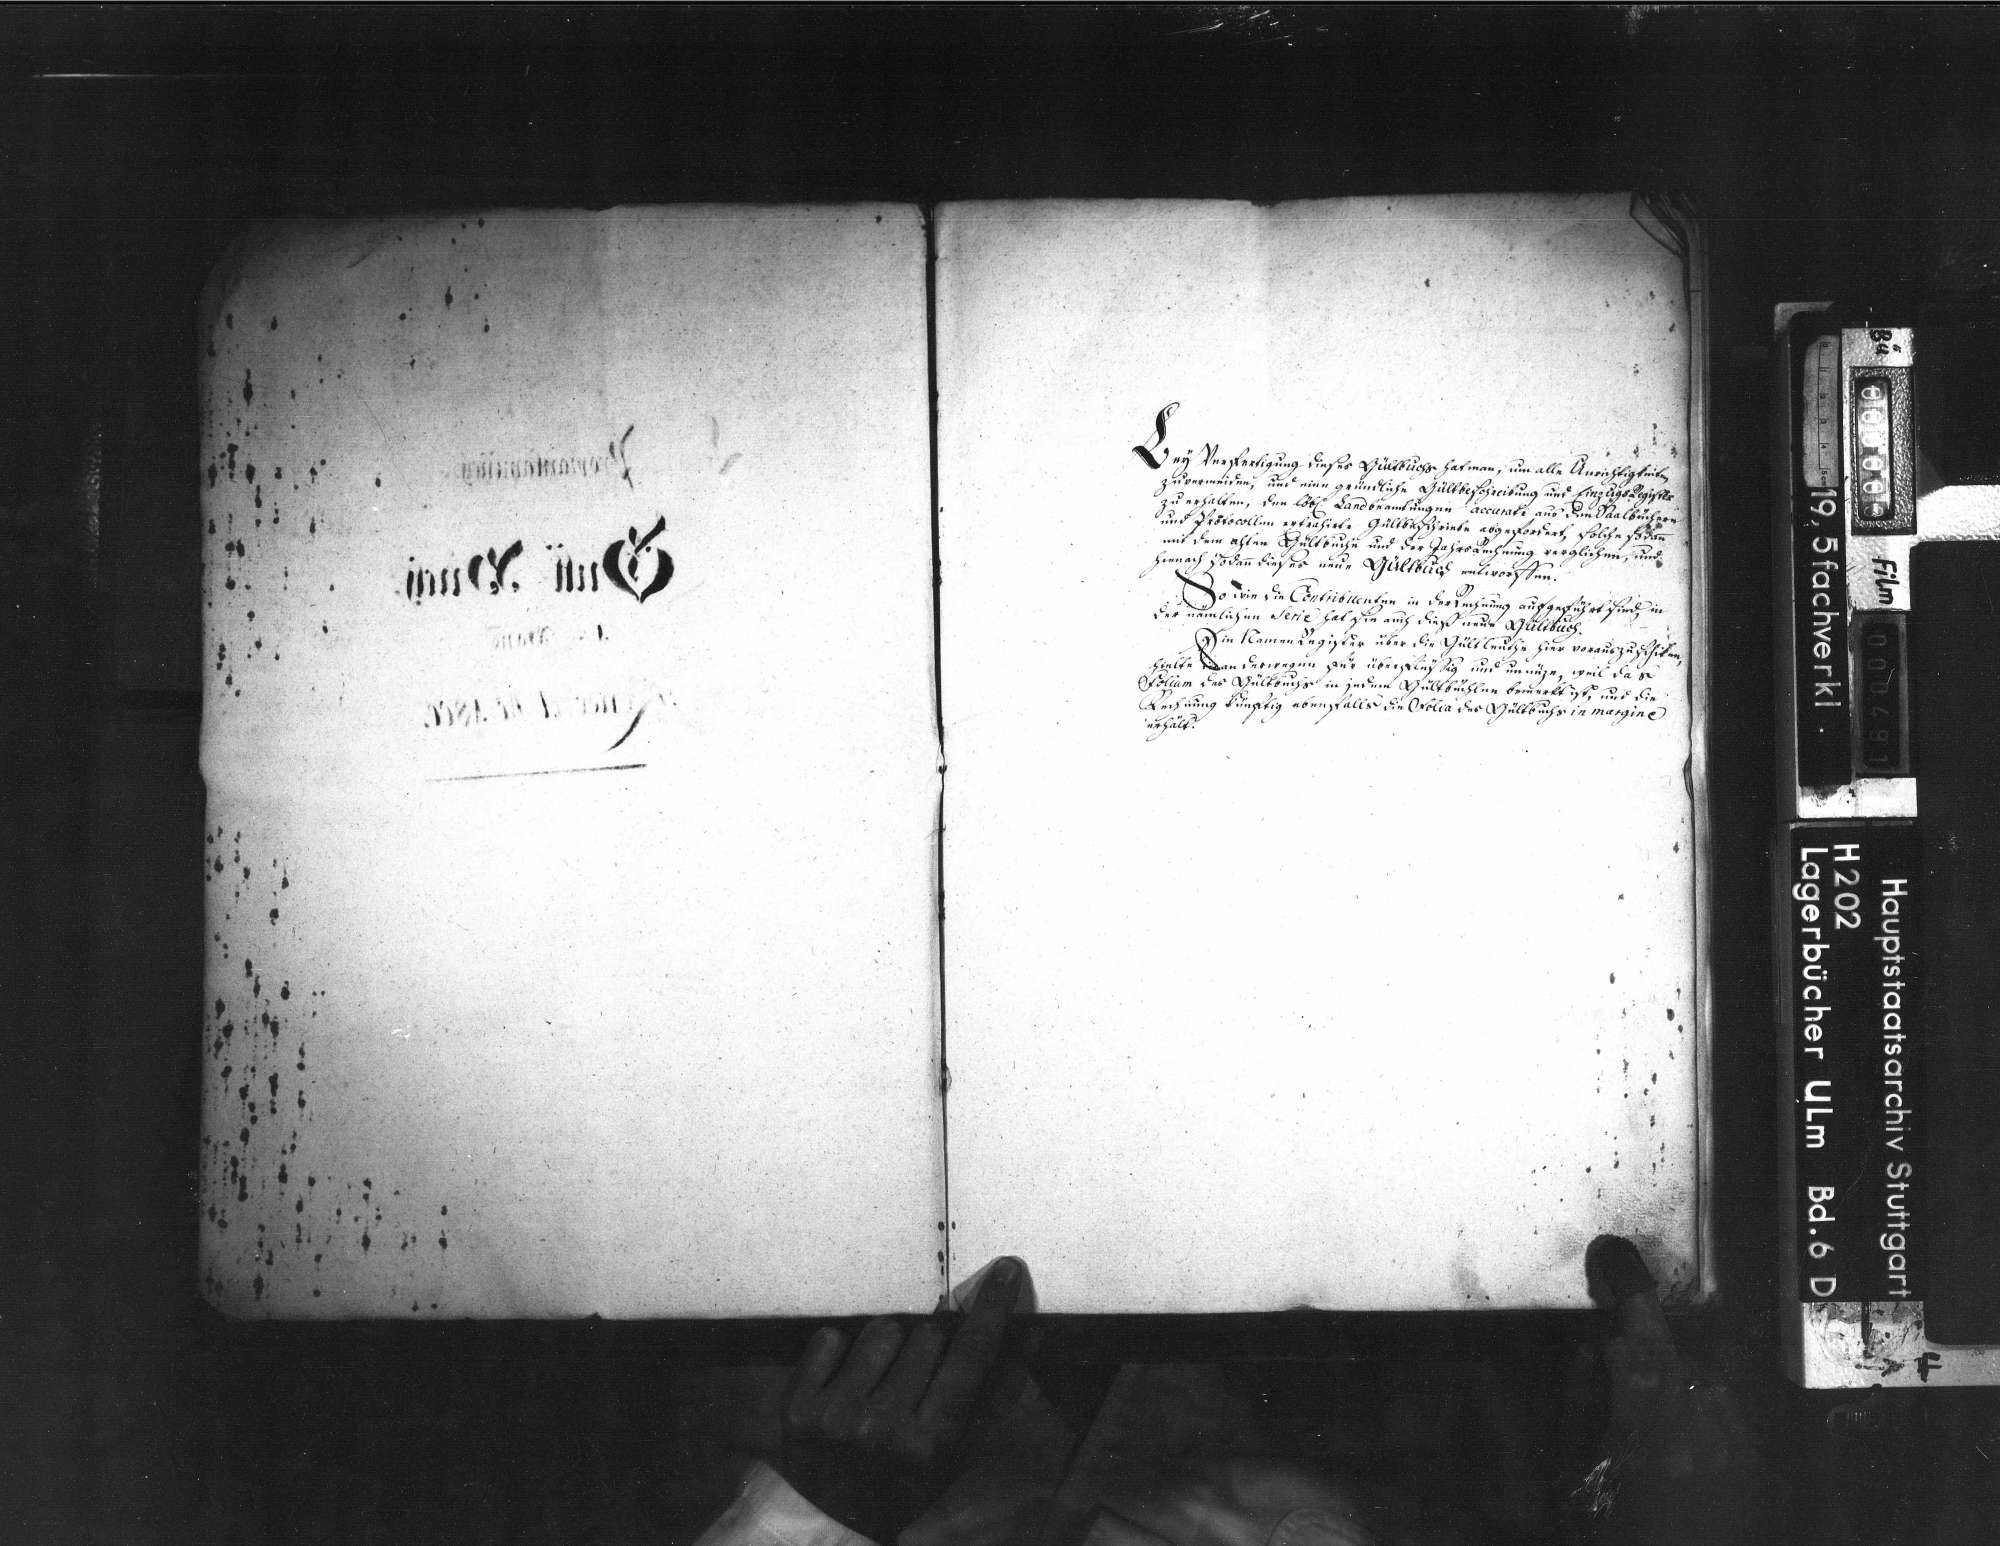 Gültbuch, Bild 2